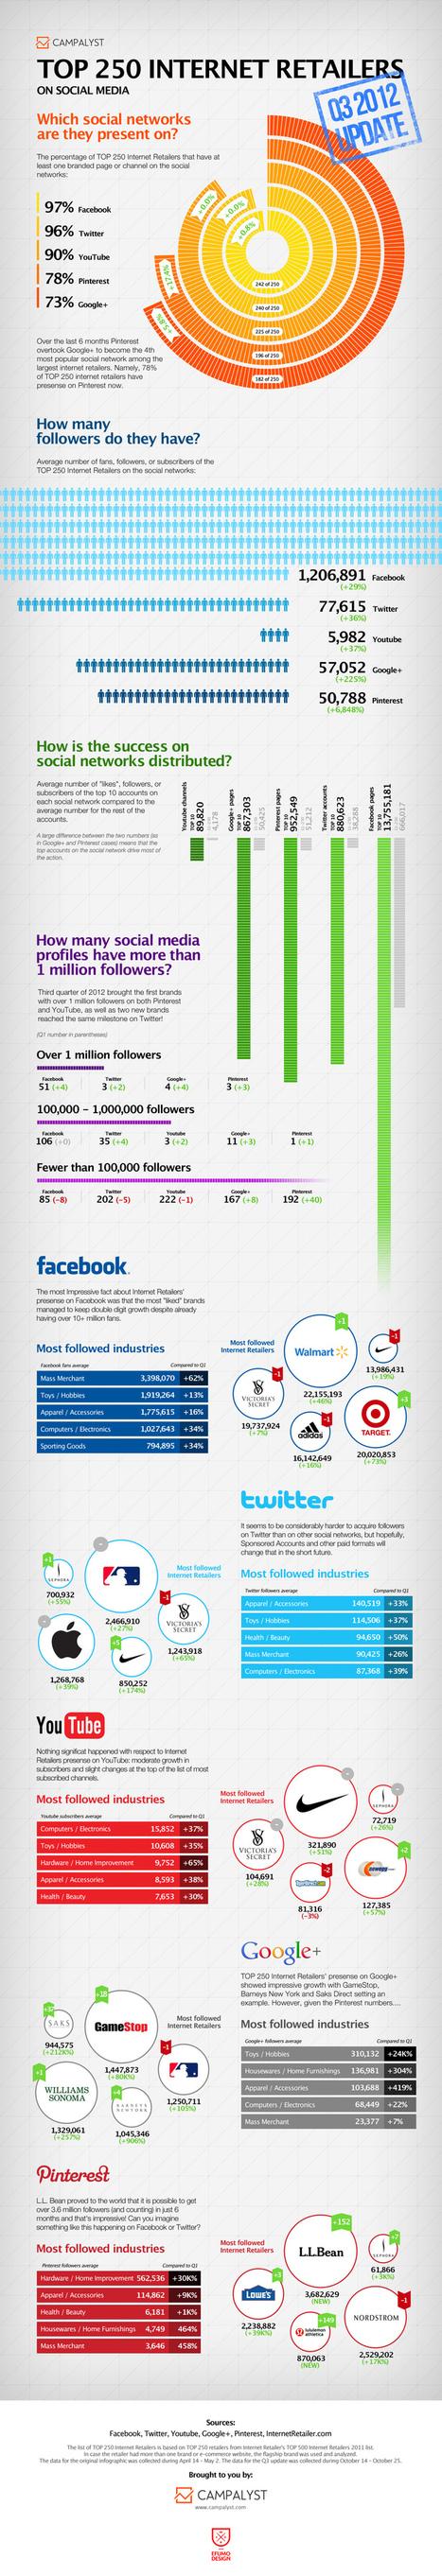 The Top Internet Retailers On Facebook, Twitter, Pinterest And Google+ [INFOGRAPHIC] - AllTwitter | Marketing & Webmarketing | Scoop.it